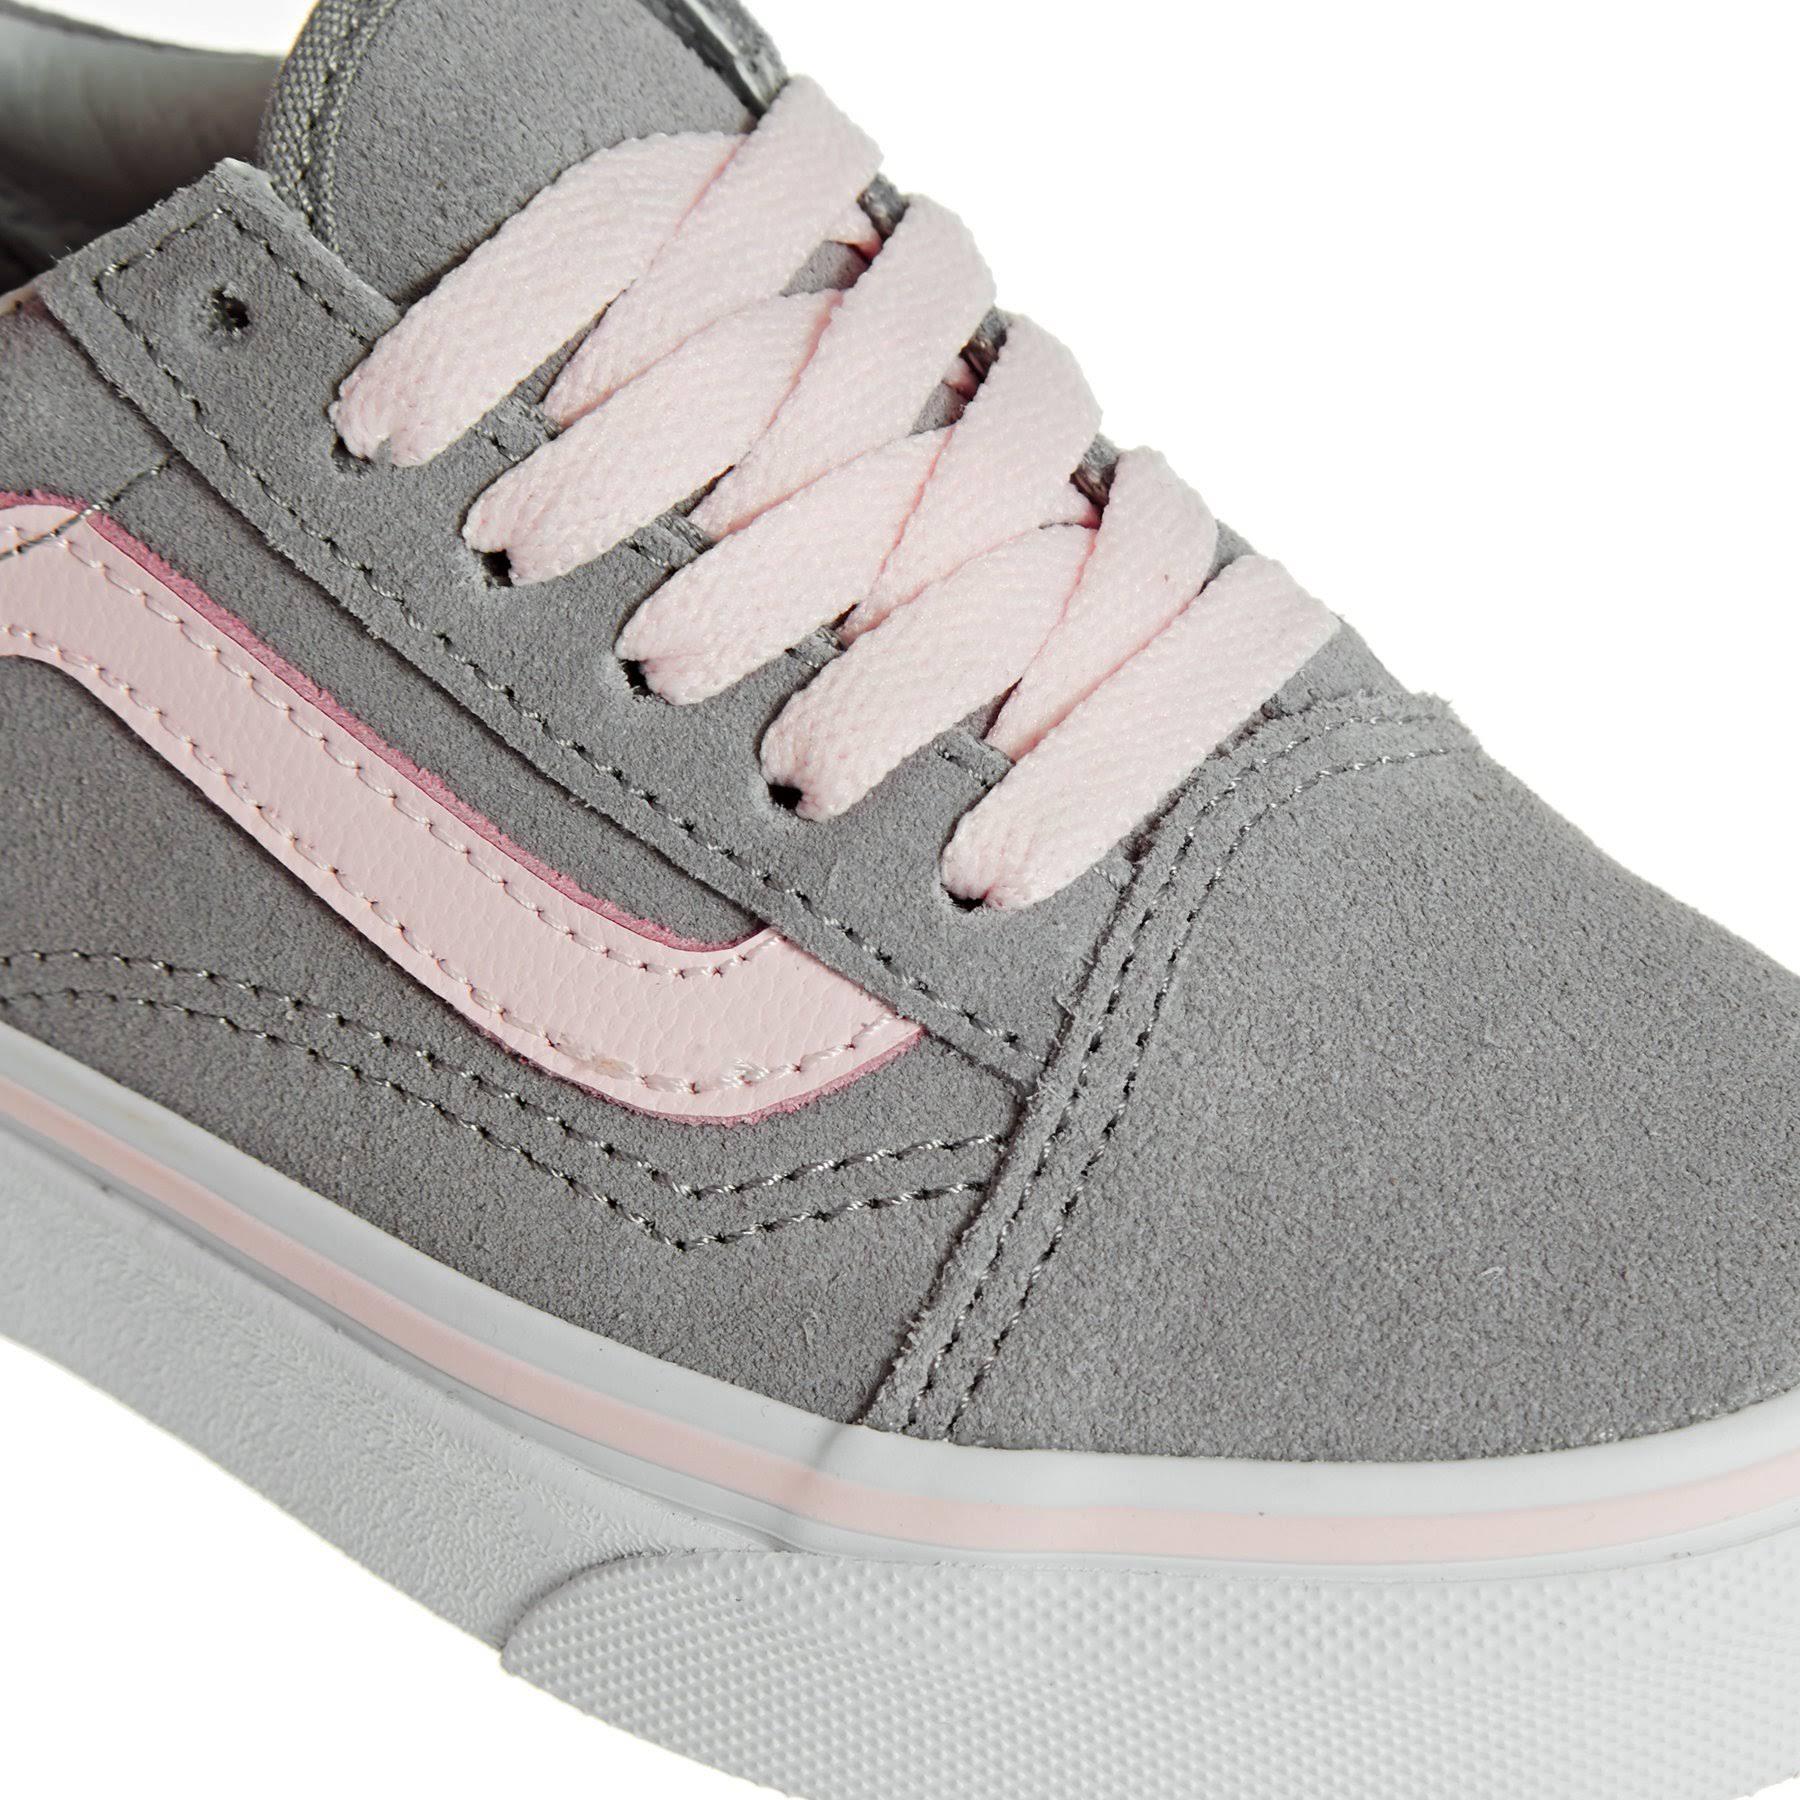 Trainers Vans Kids And Skool Old Pink Grey Suede qw07Hqr